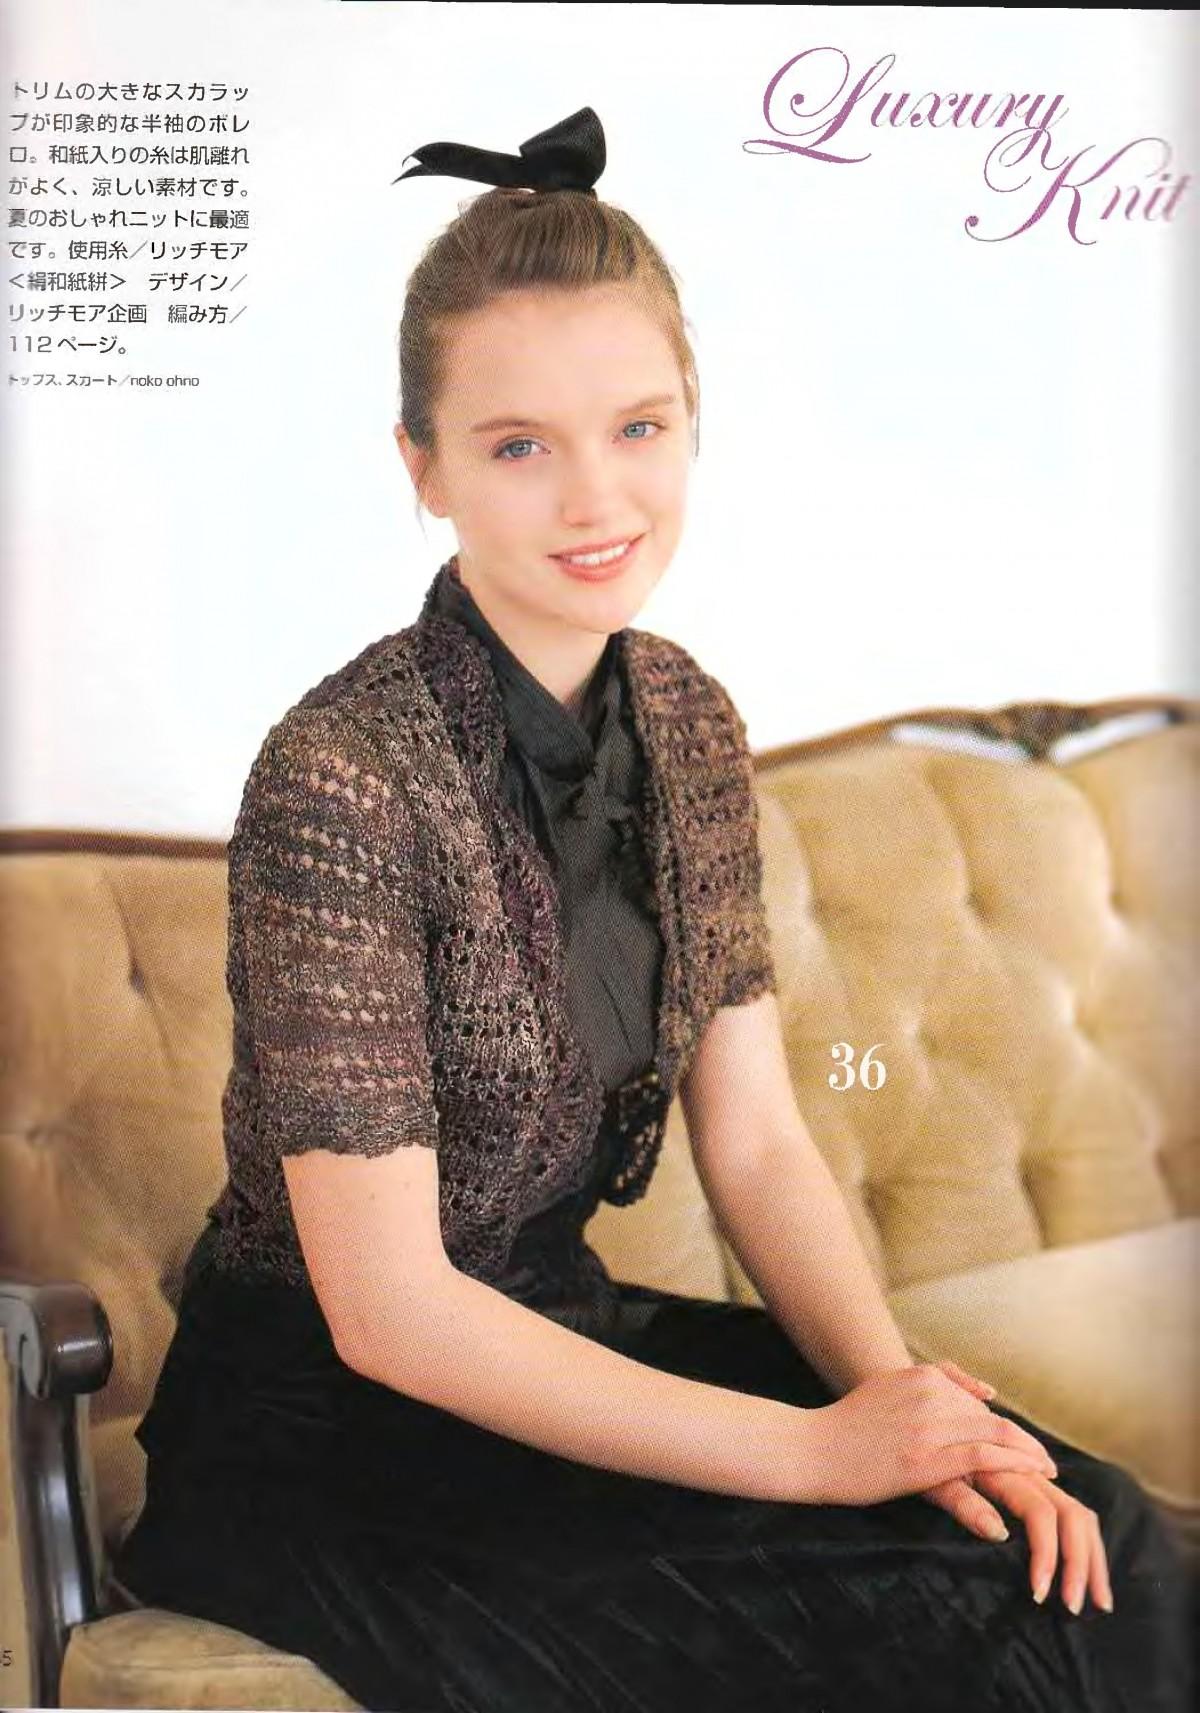 Lets-knit-series-NV4359-2008-Spring-Summer-sp-kr_43.jpg